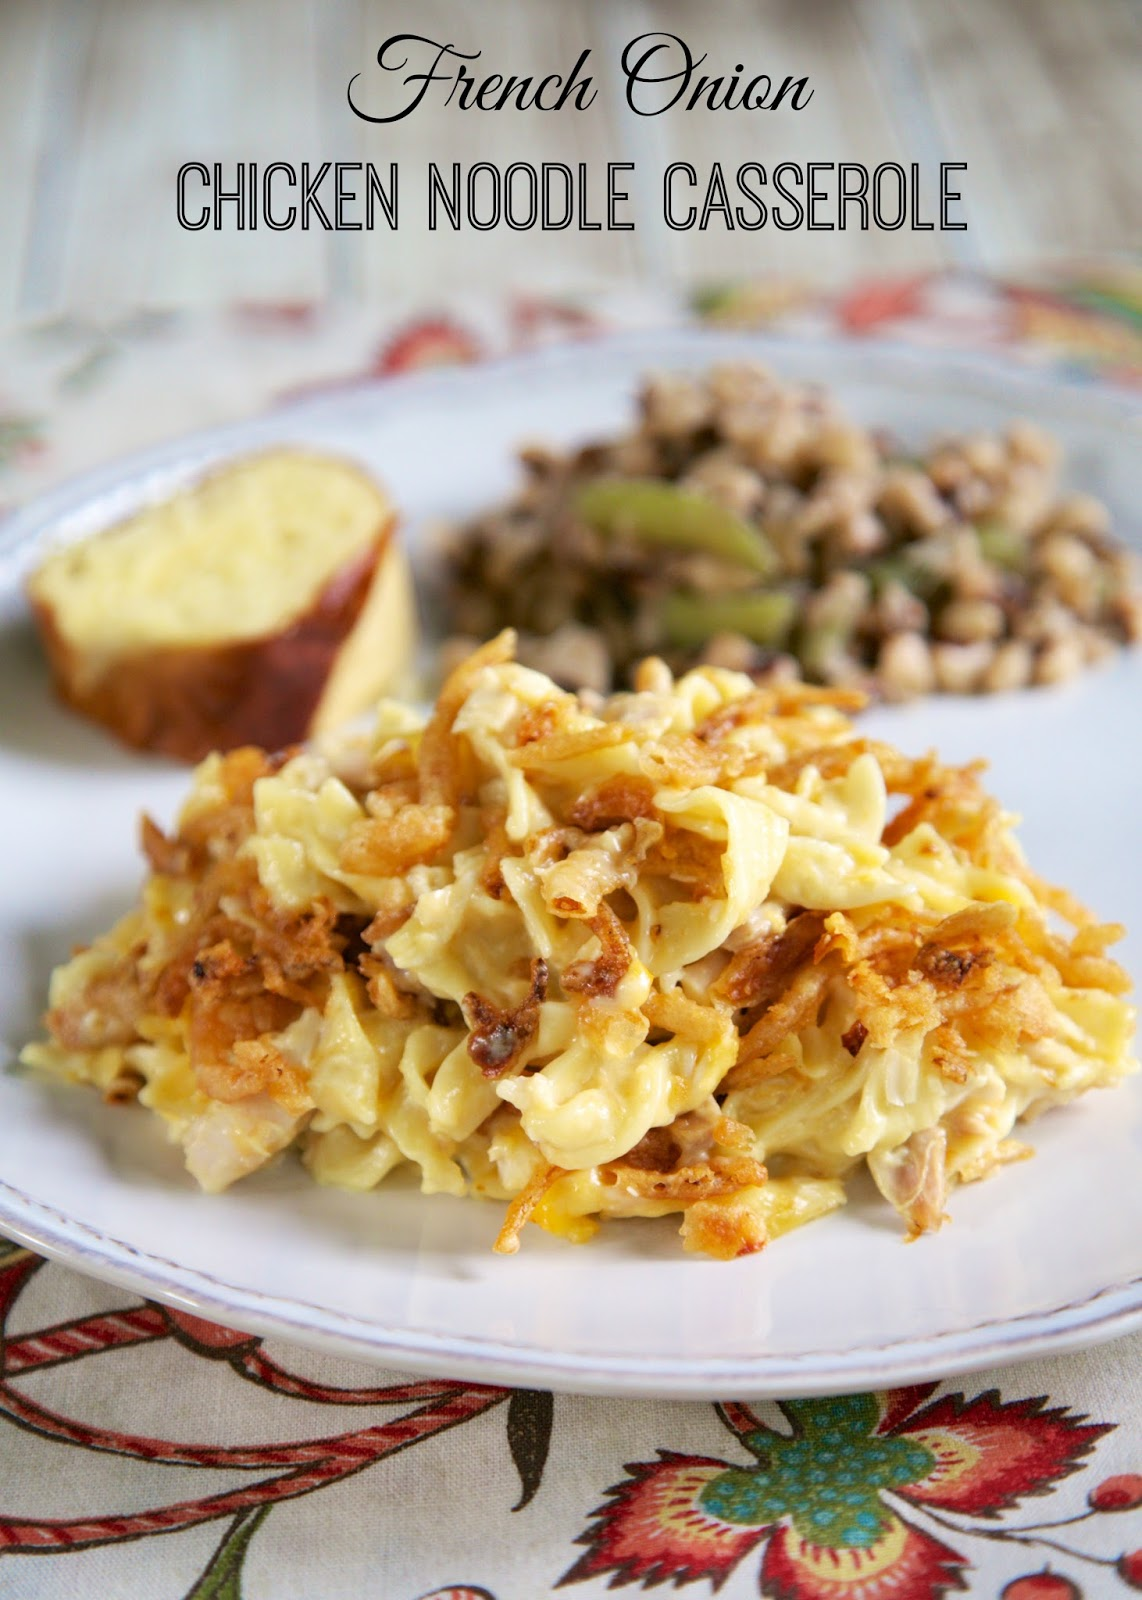 french onion chicken noodle casseroleA